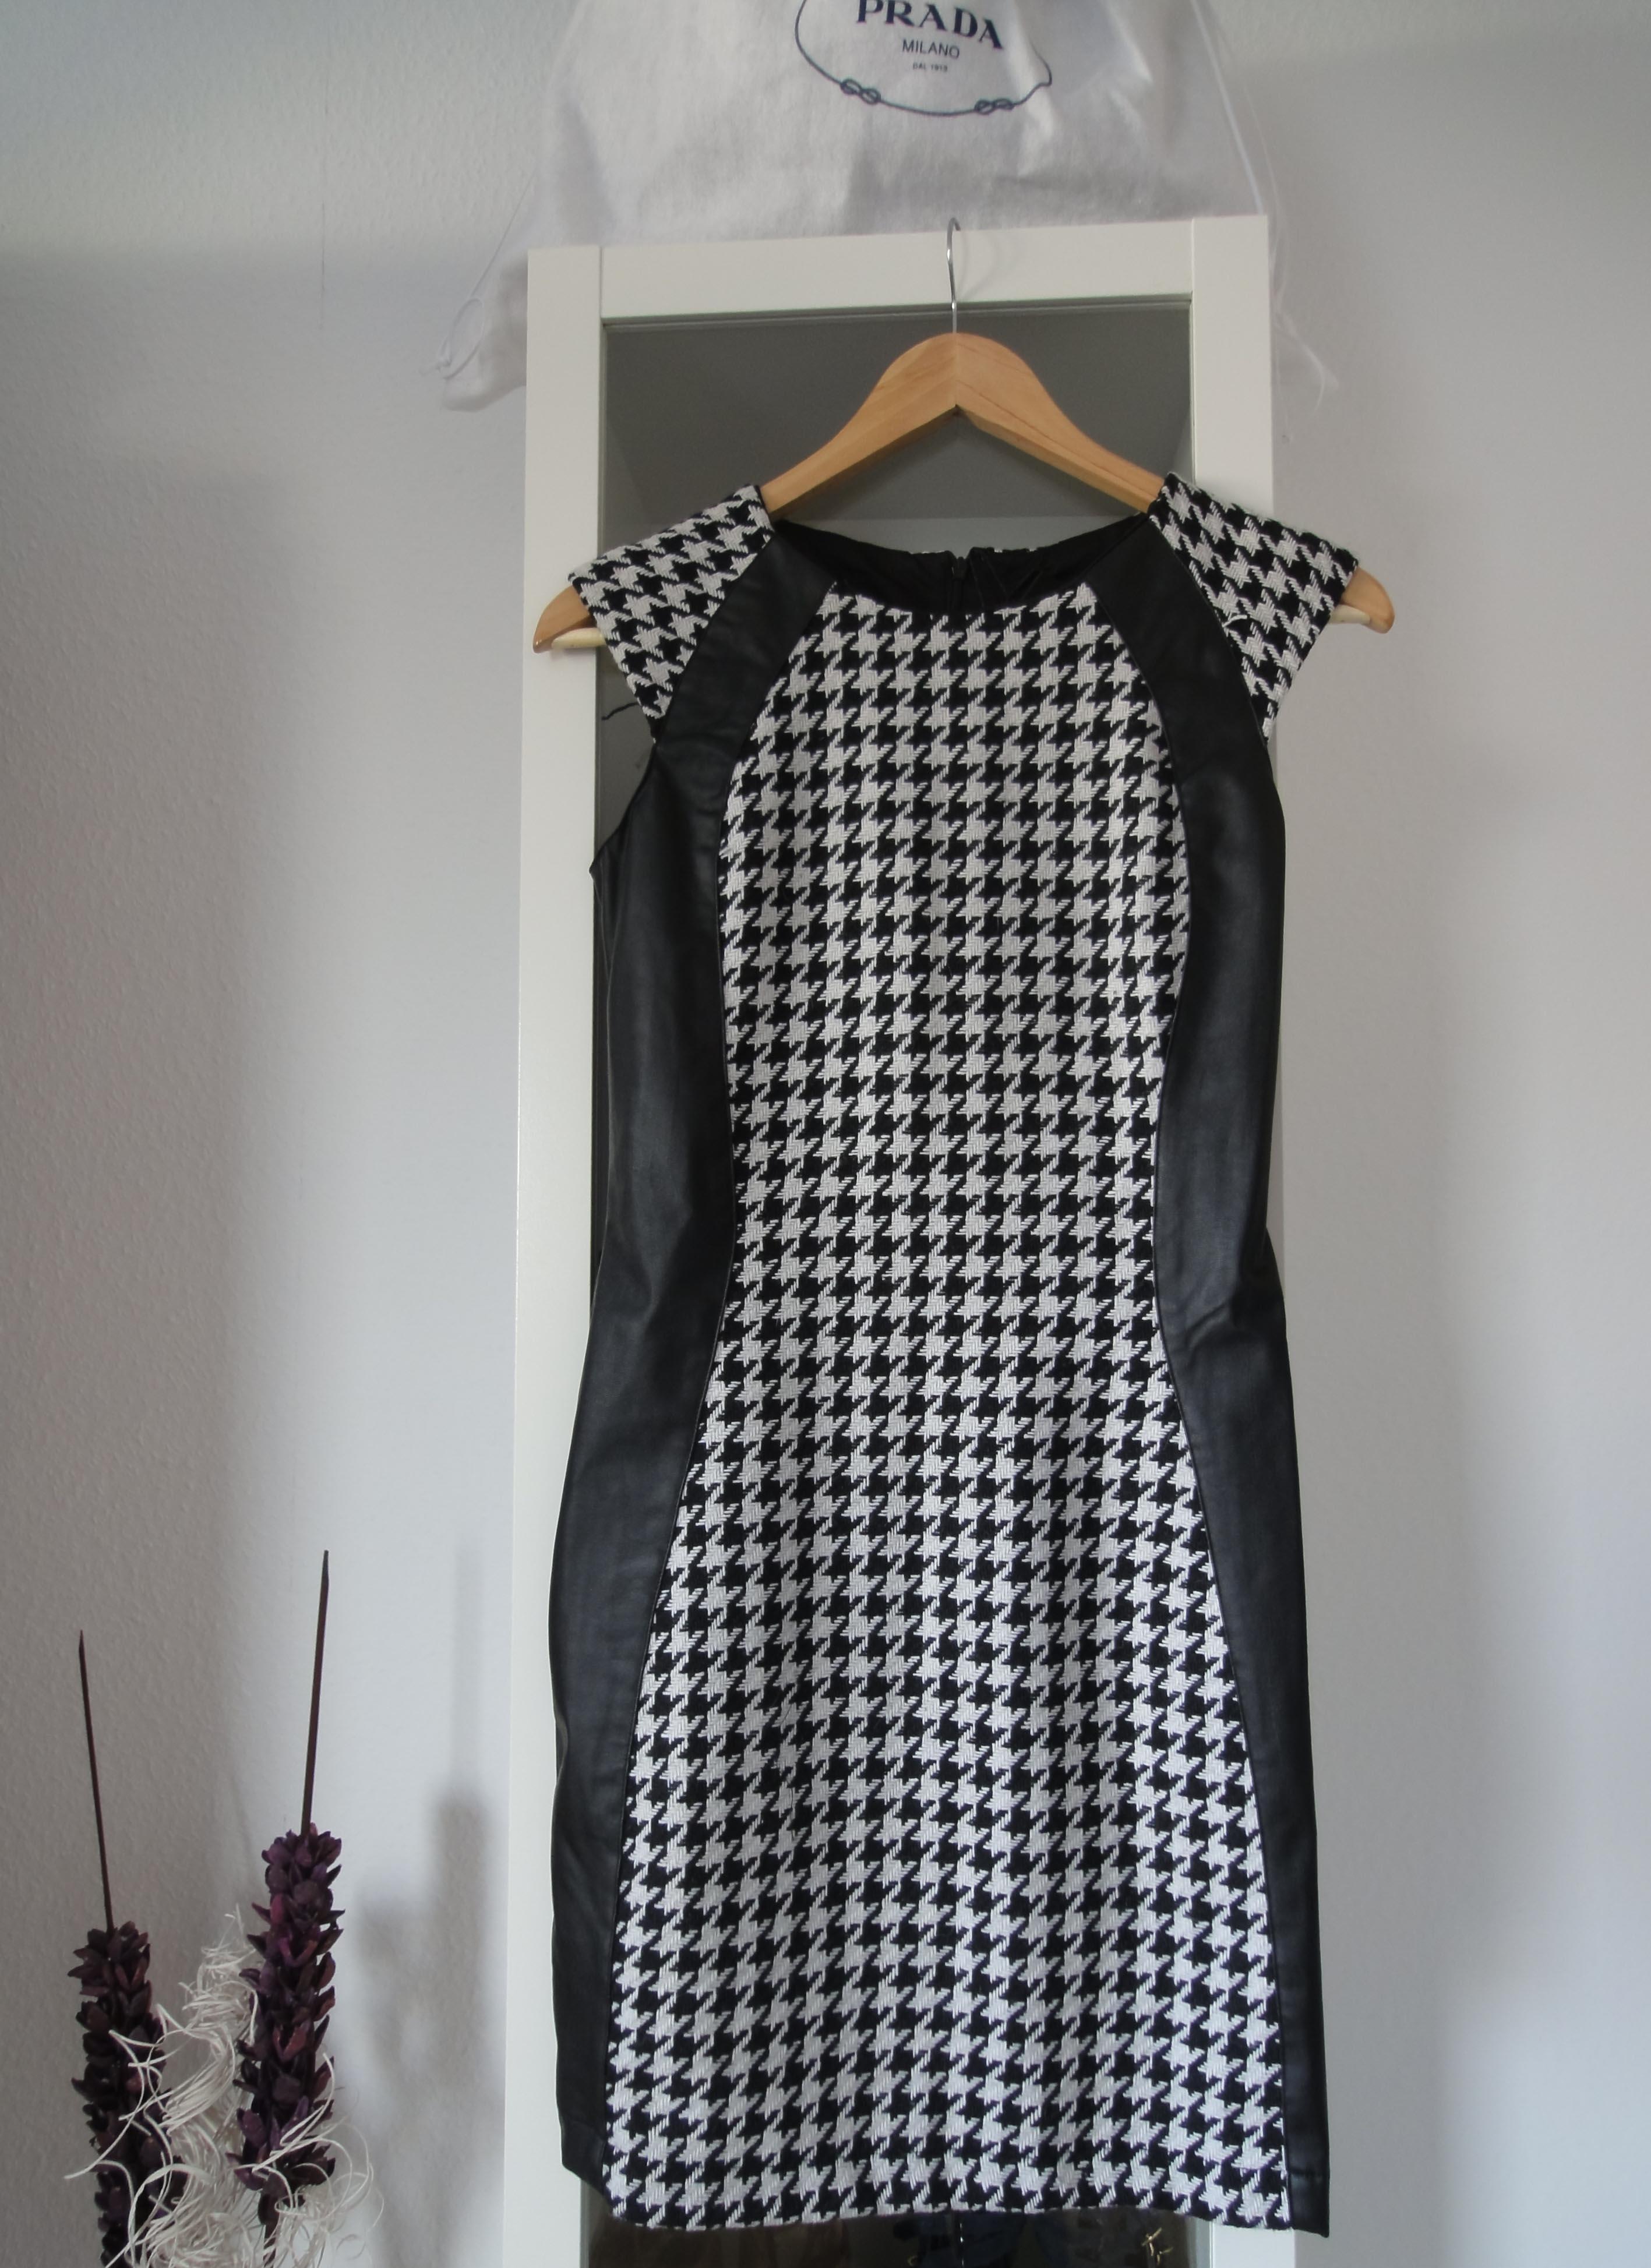 Kleid Karo Muster Shopping Haul Primark New Yorker Shopping Ausbeute Köln Modeblog New in